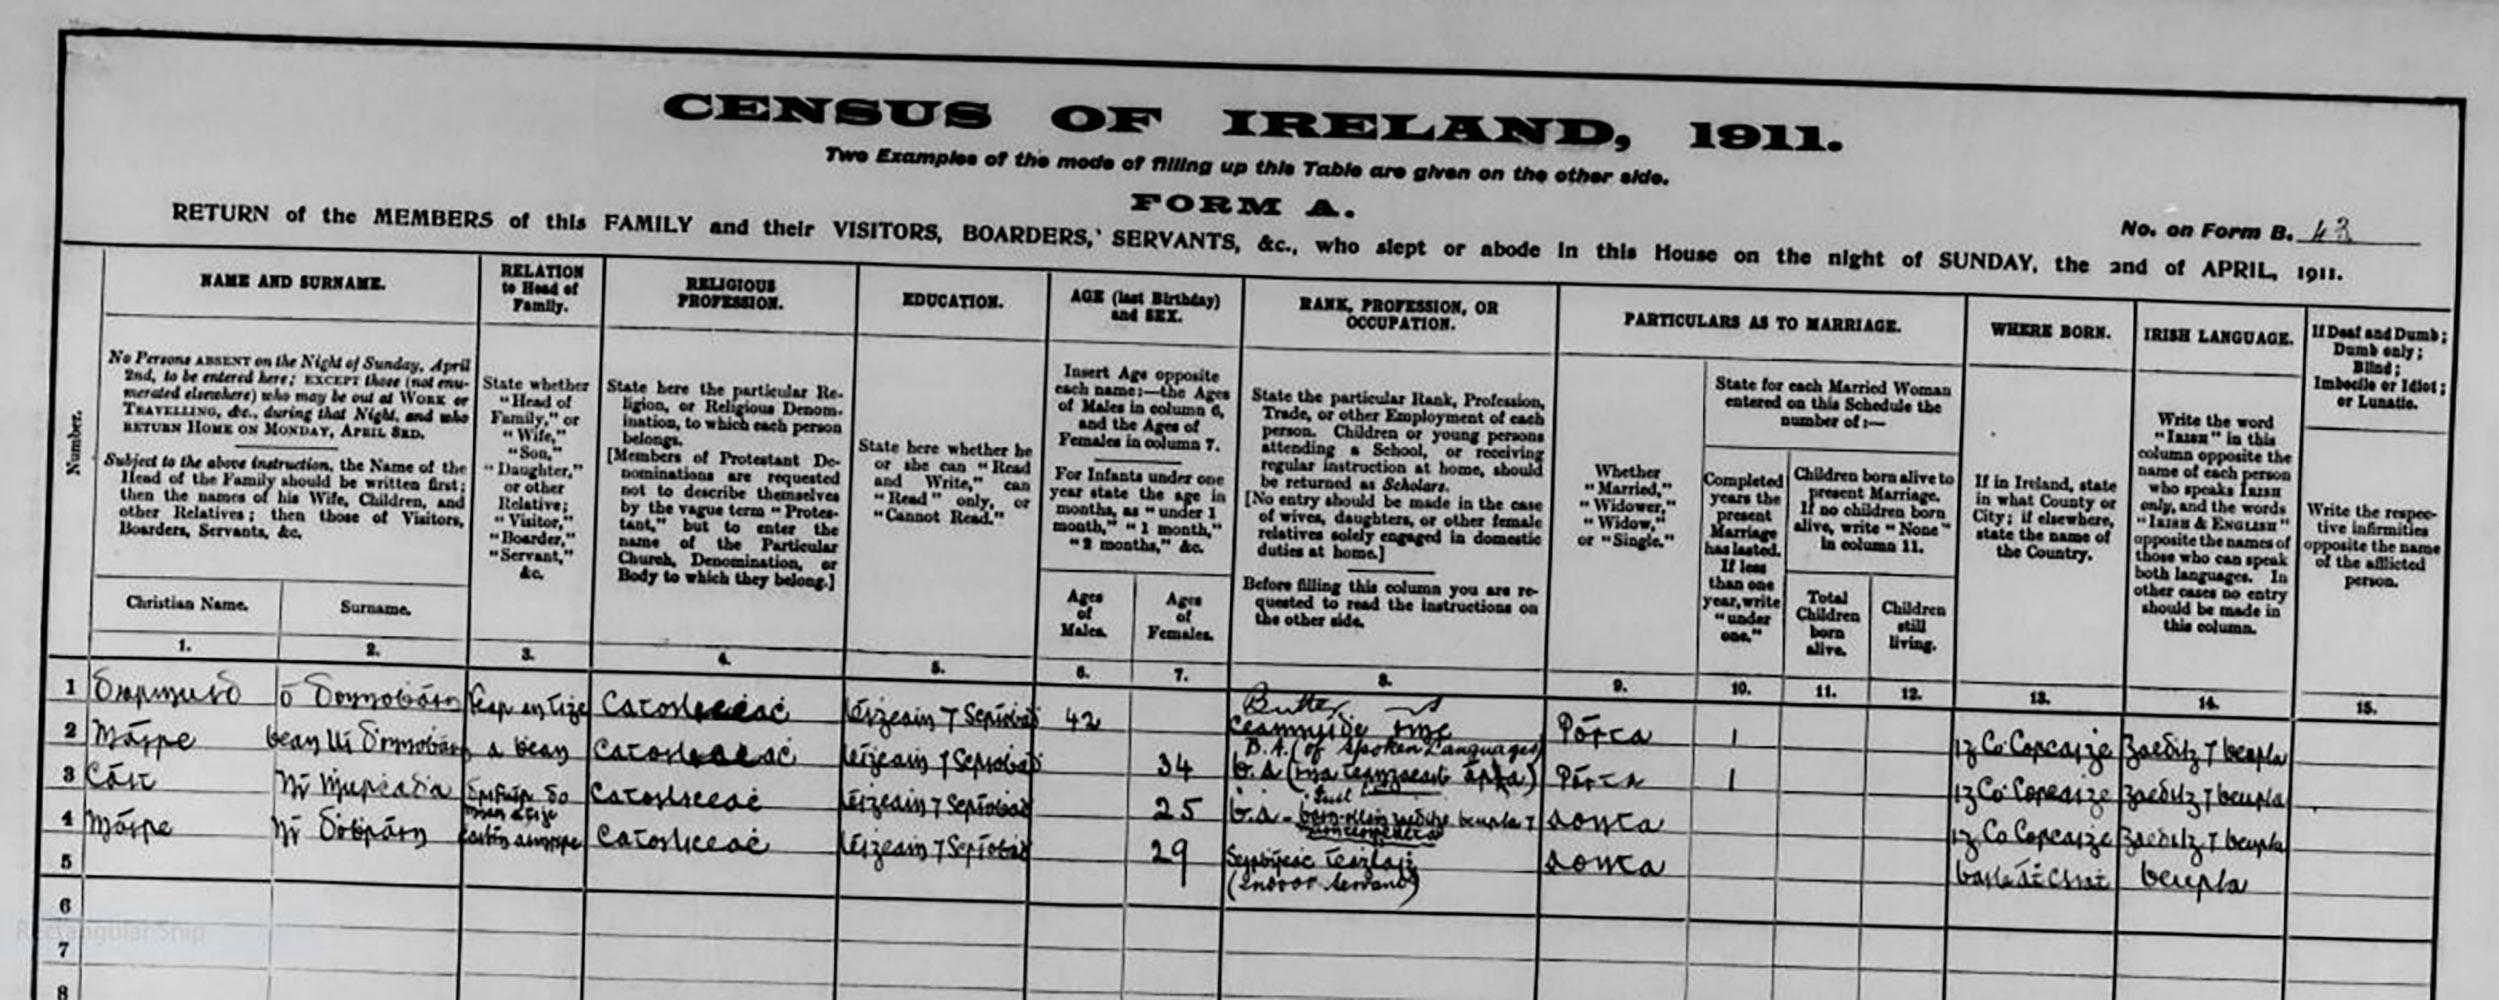 Kate Murphy 1911 Census Return